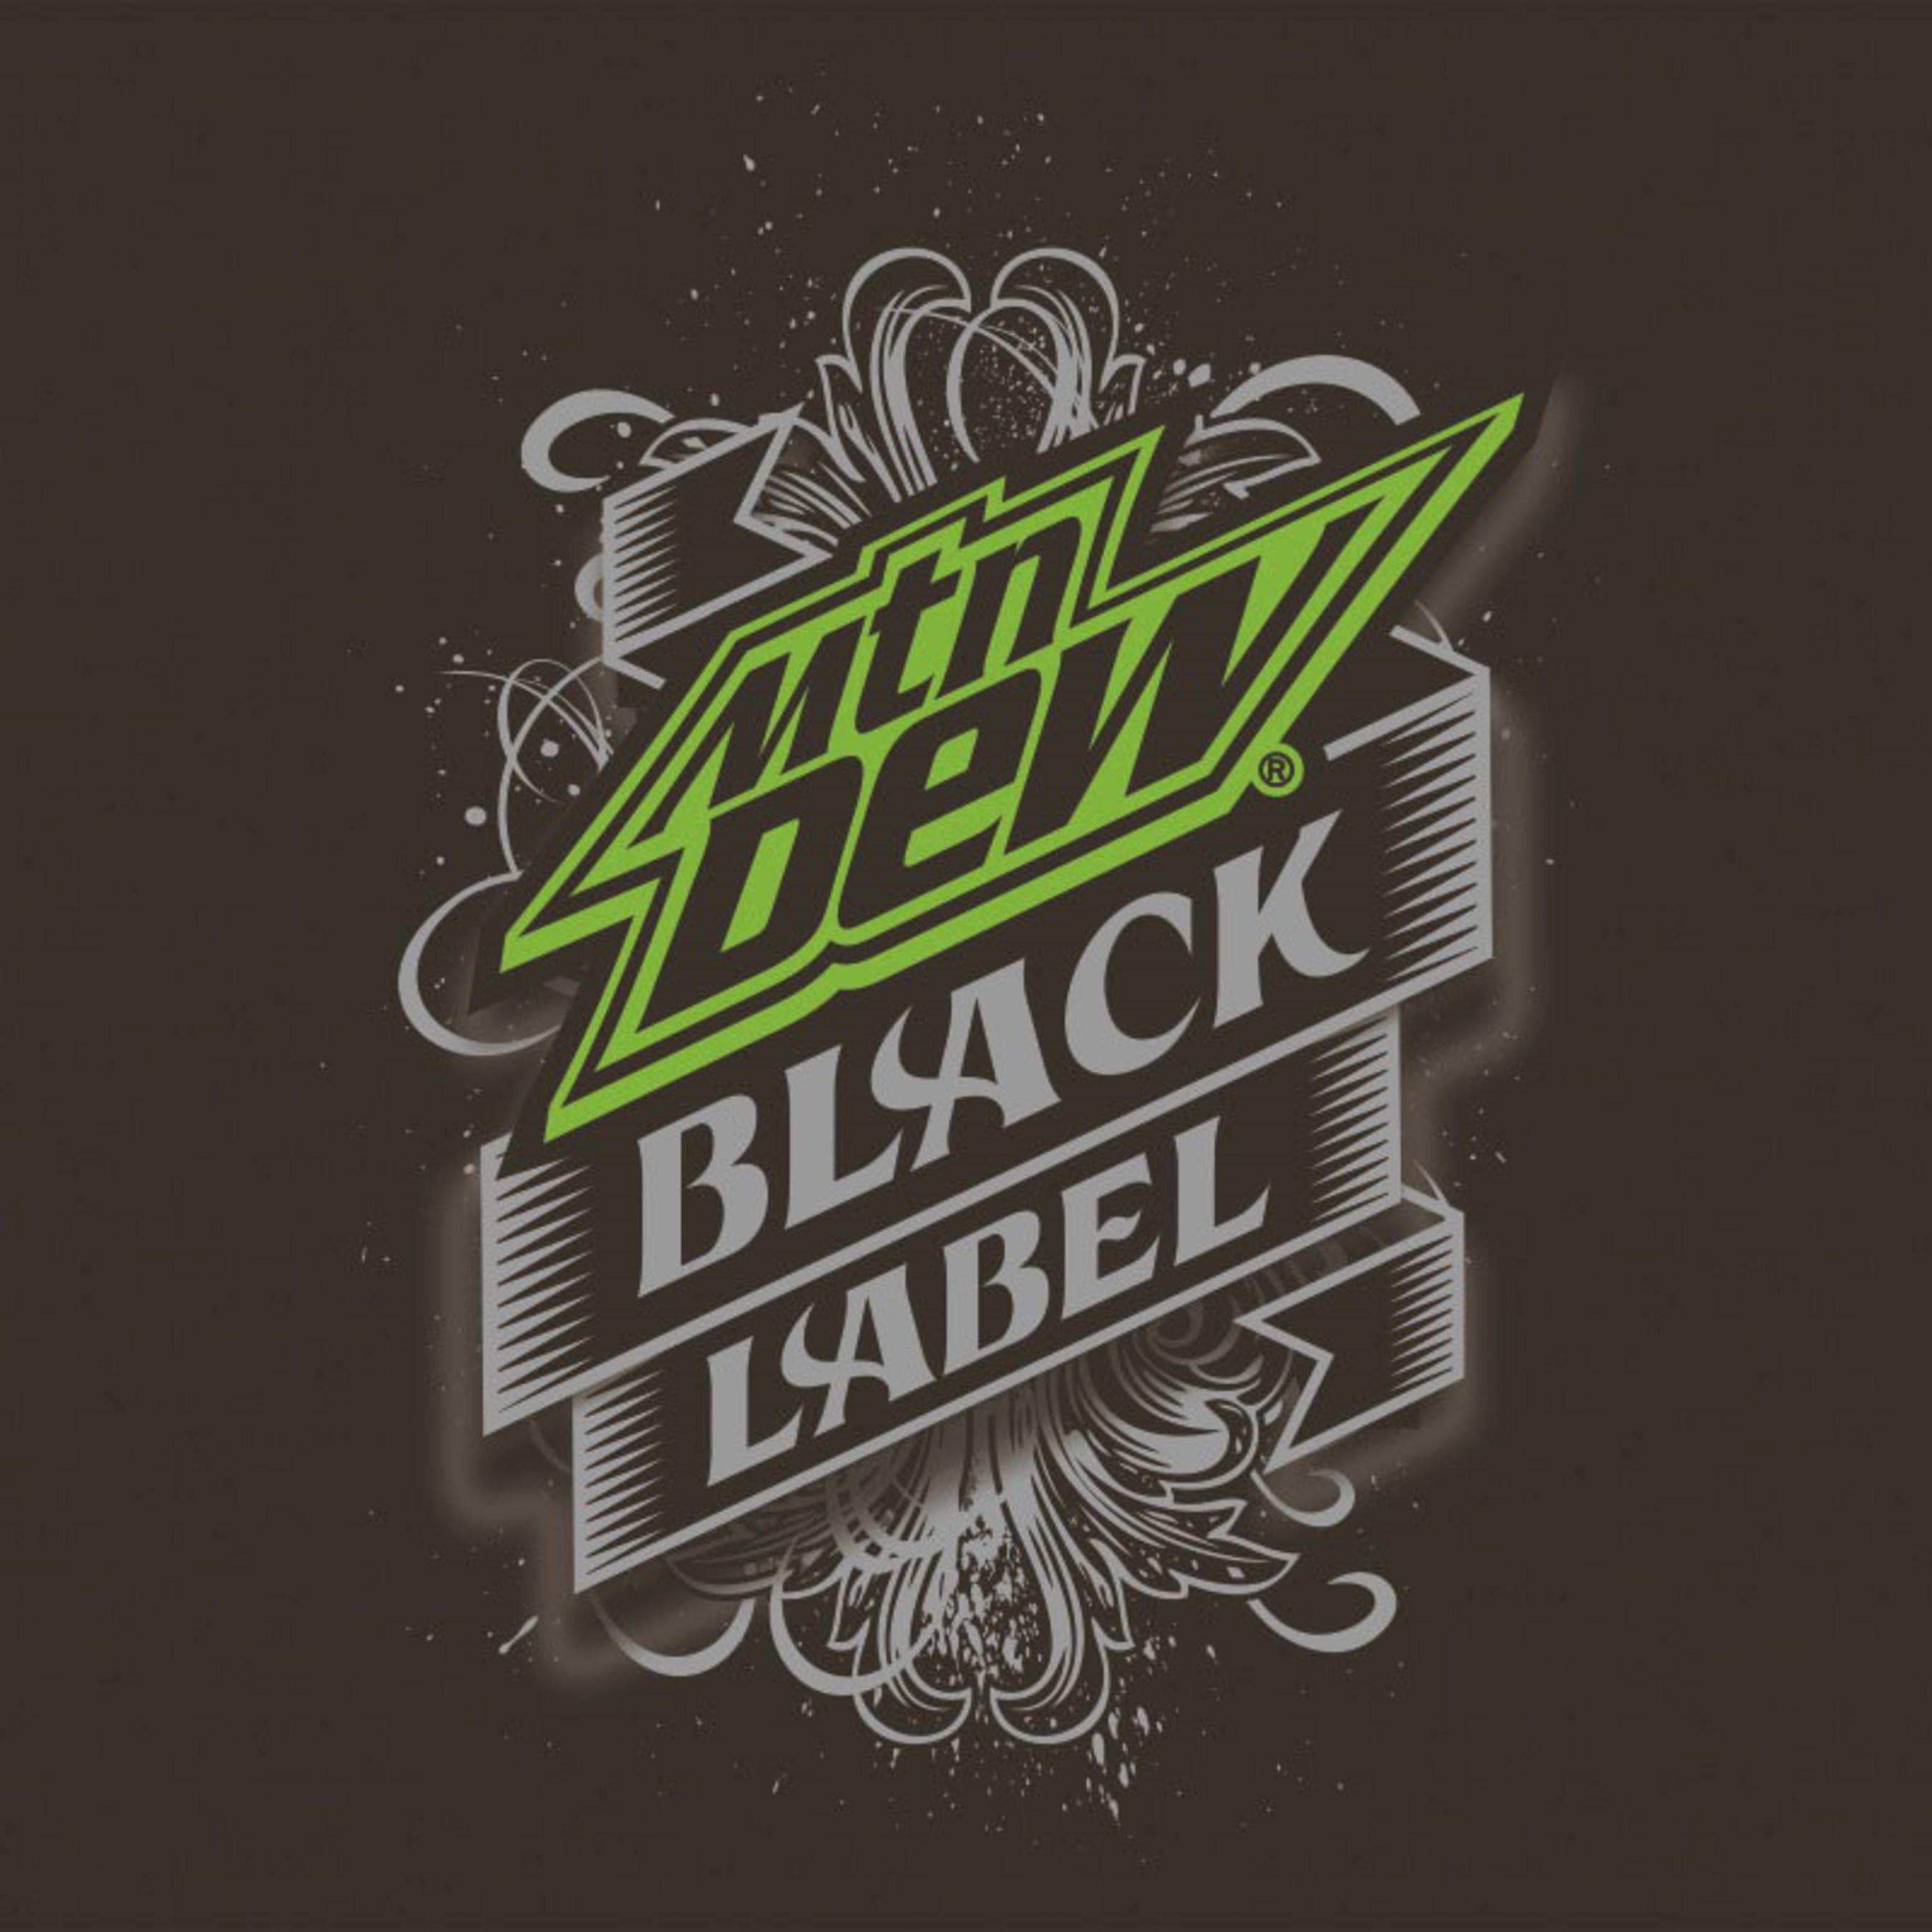 MTN DEW(R) BLACK LABEL(R)